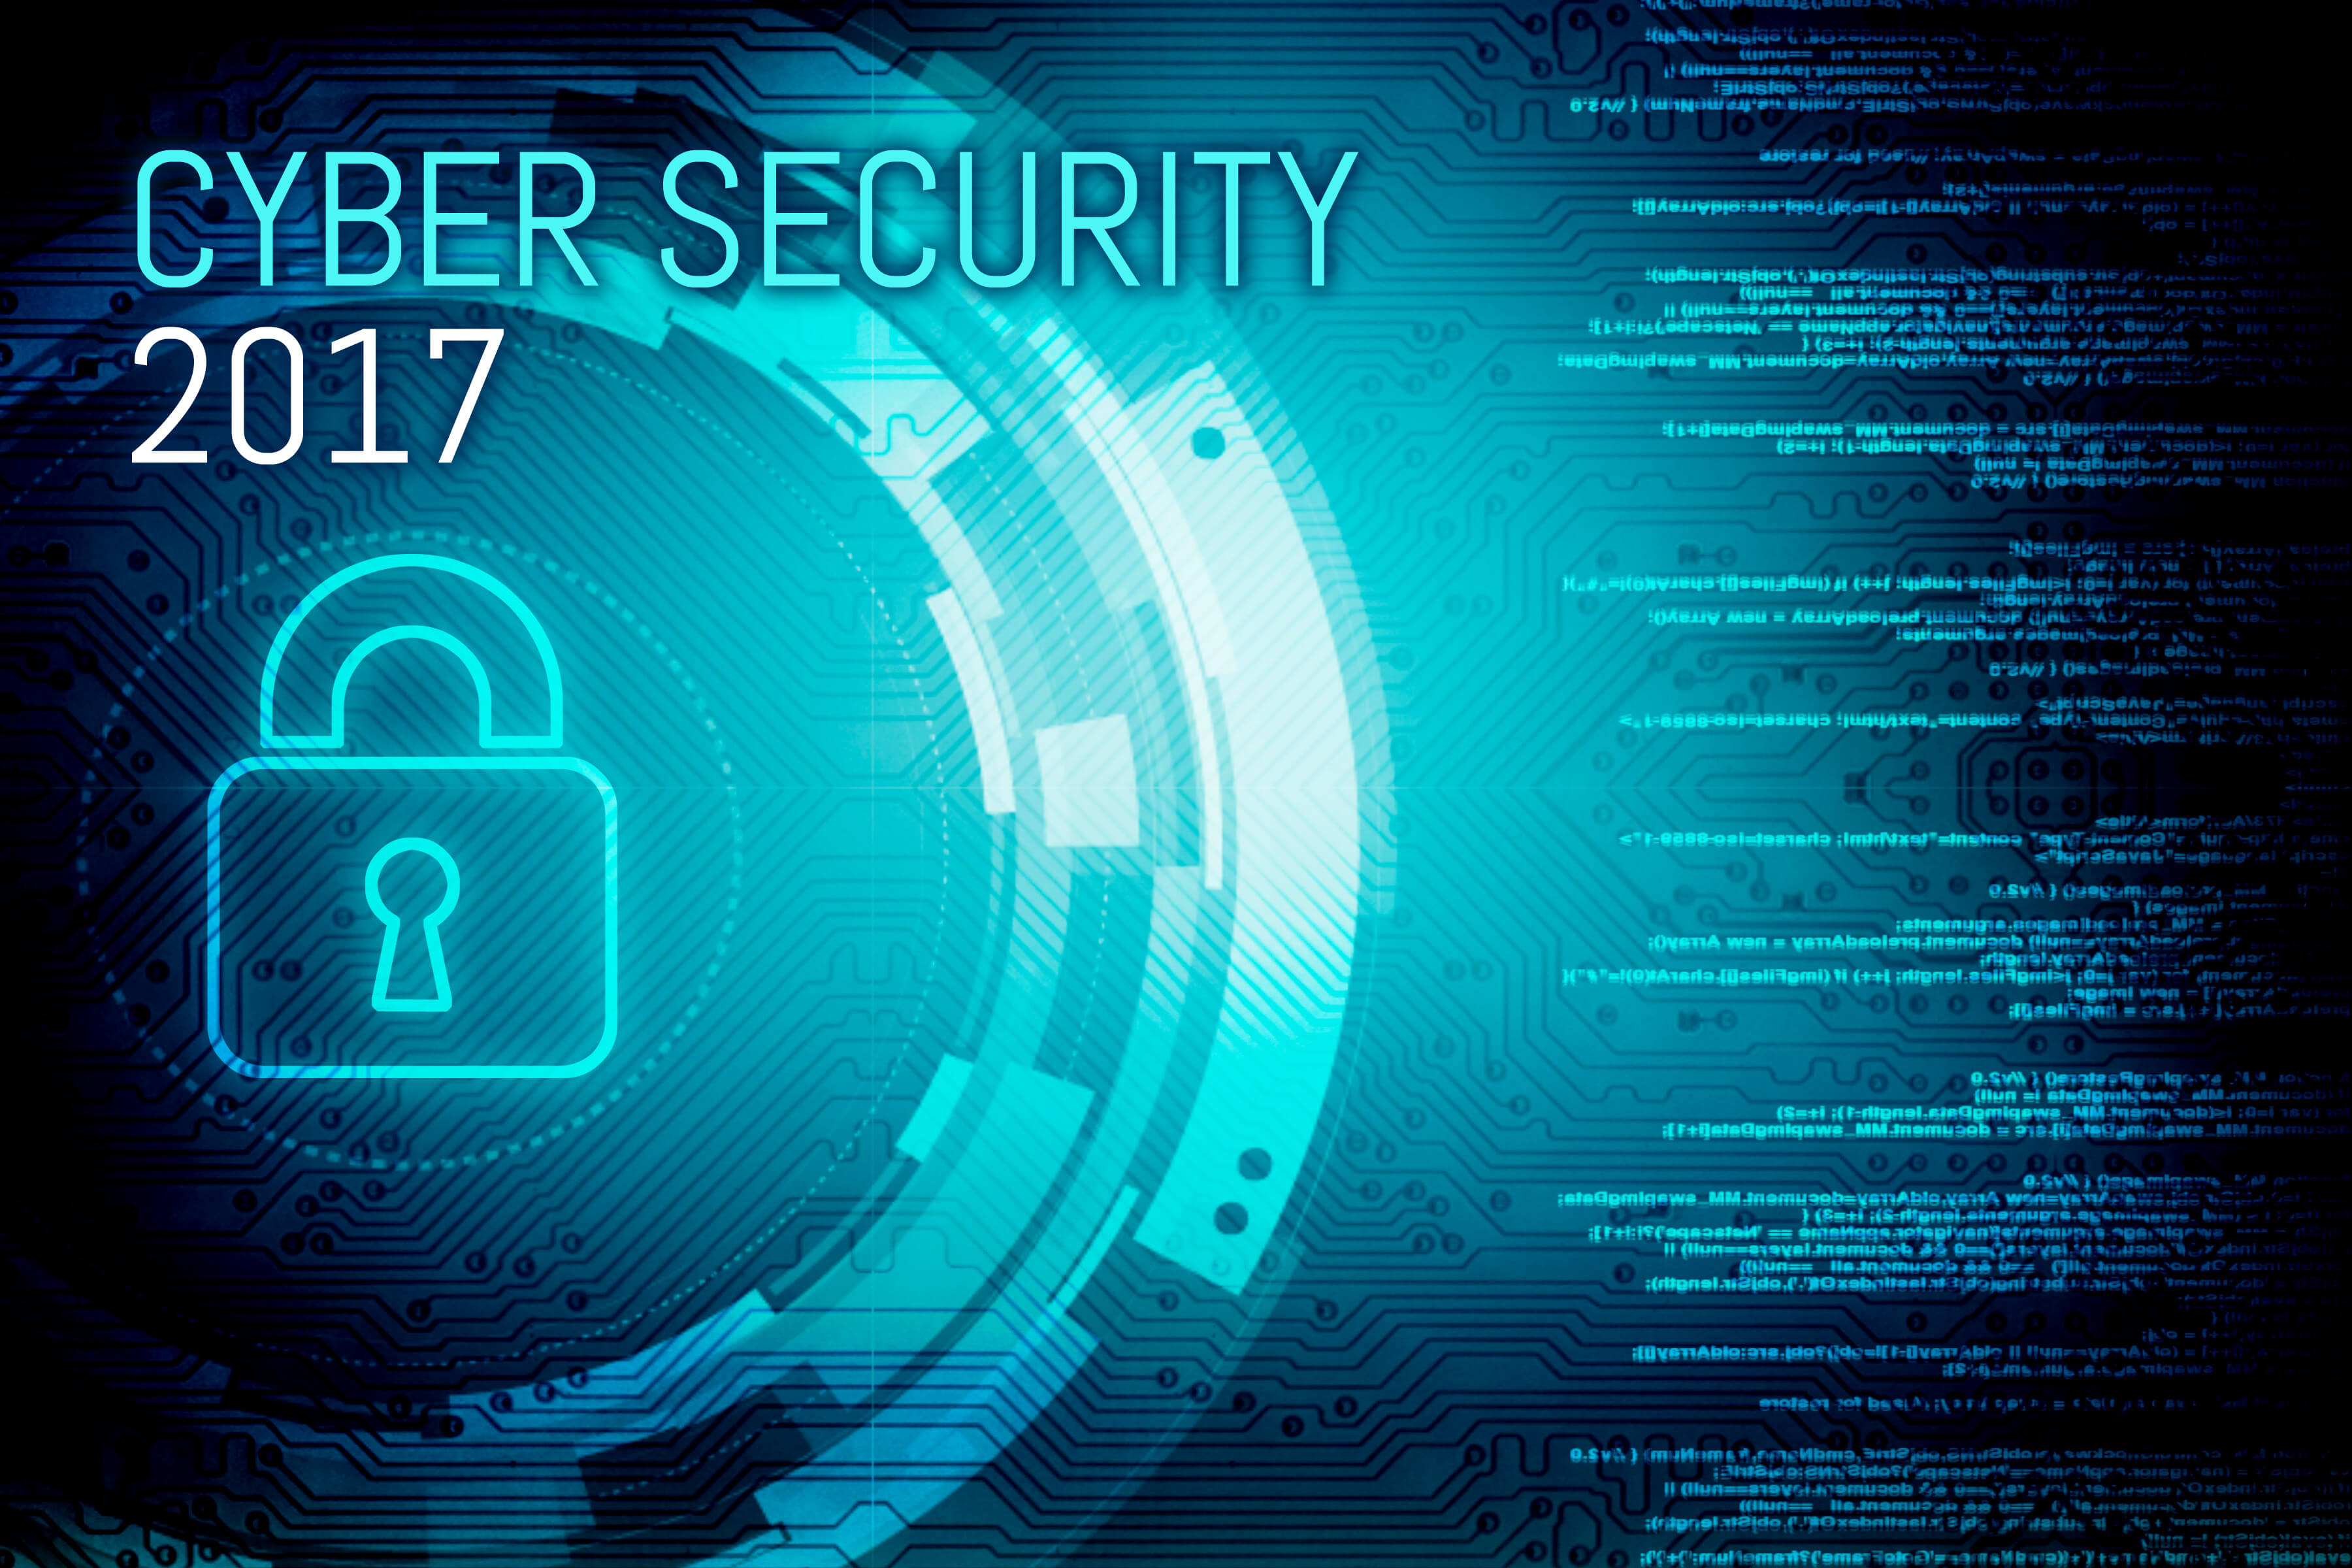 3 Major Cybersecurity Trends in 2017 Smarttech